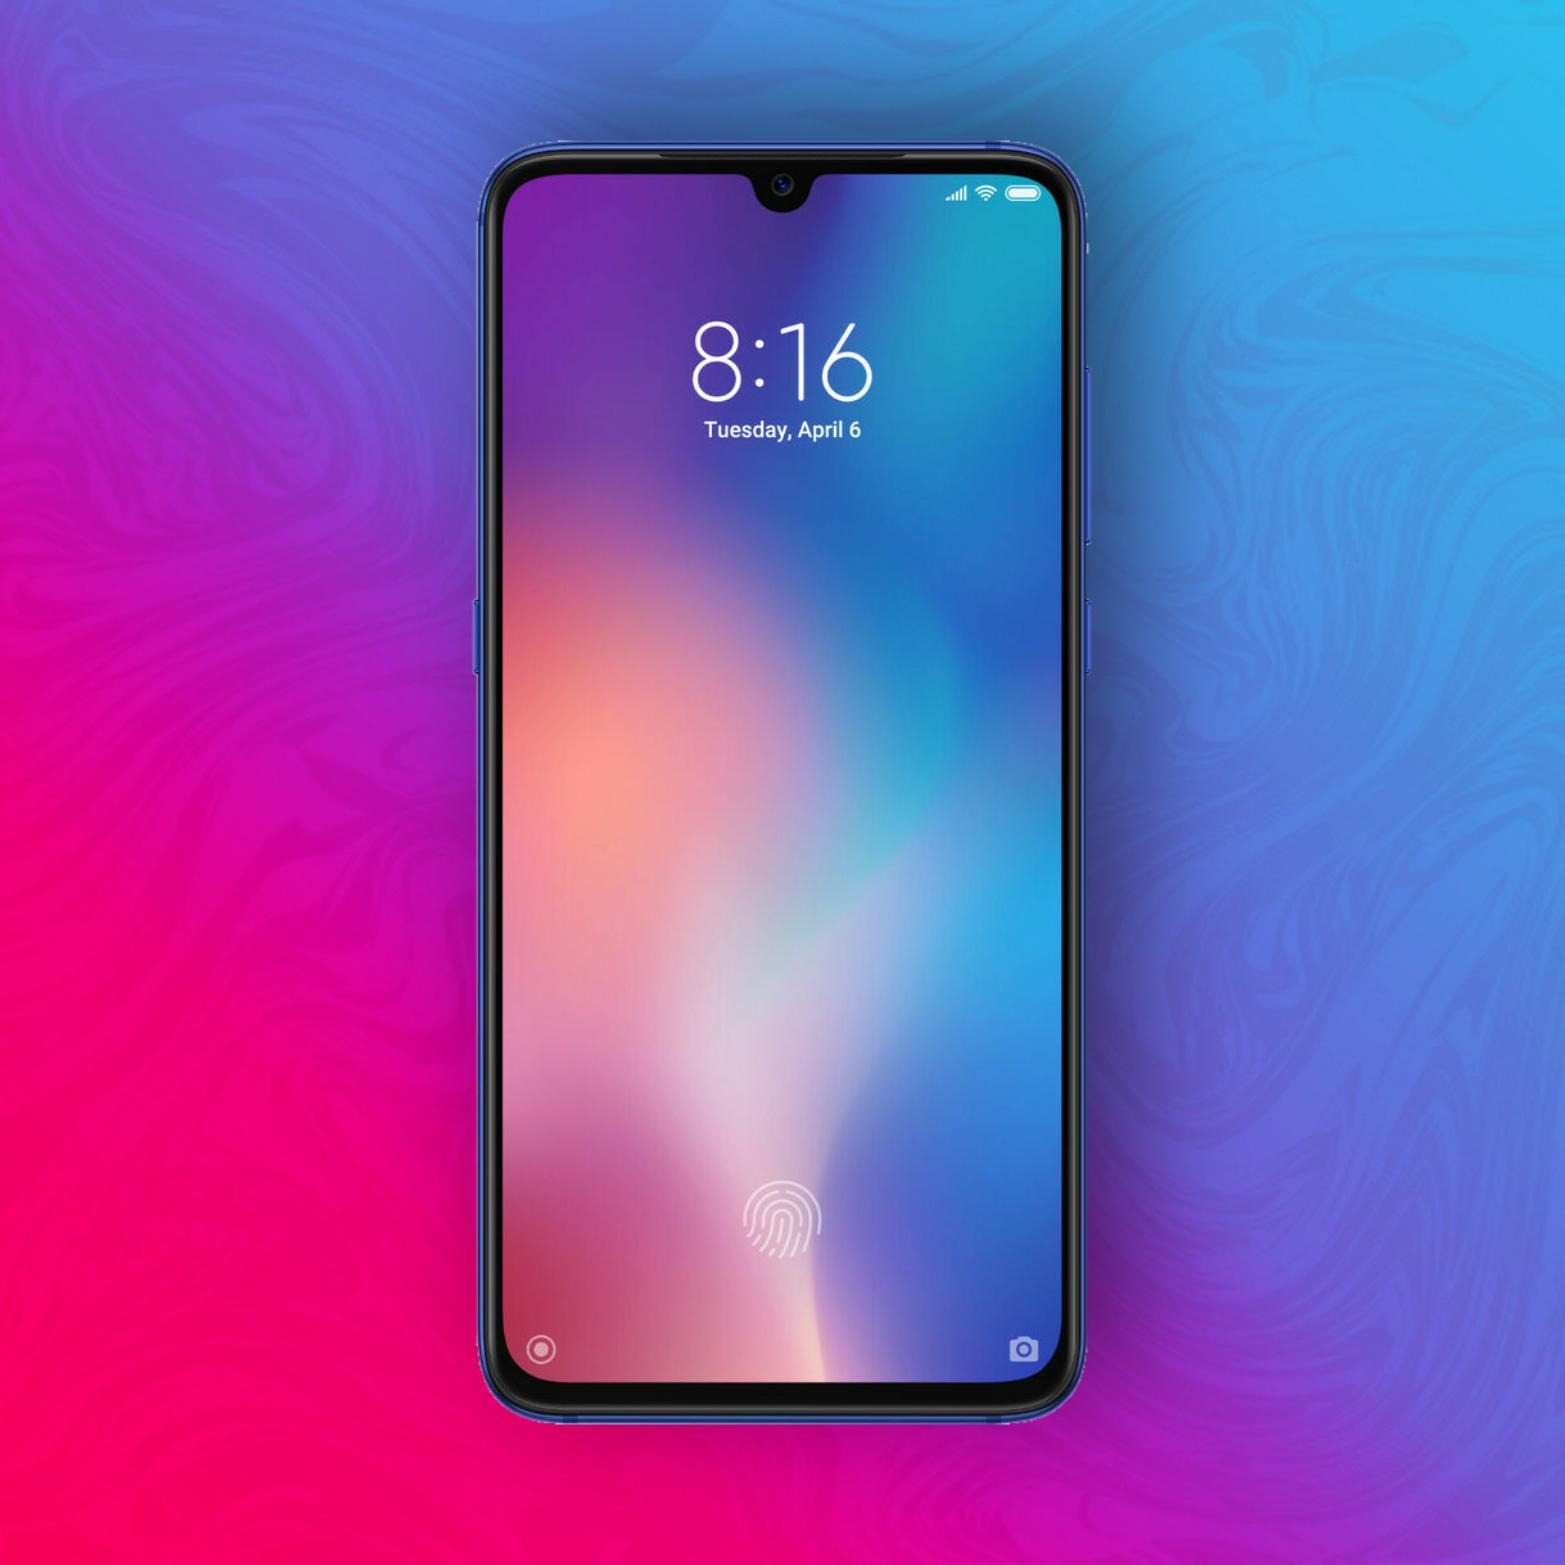 "Xiaomi Mi 9 SE 64/6GB - Snapdragon 712 - 5,97"" Super Amoled - 48MP/8MP/13MP - NFC: Google Pay"